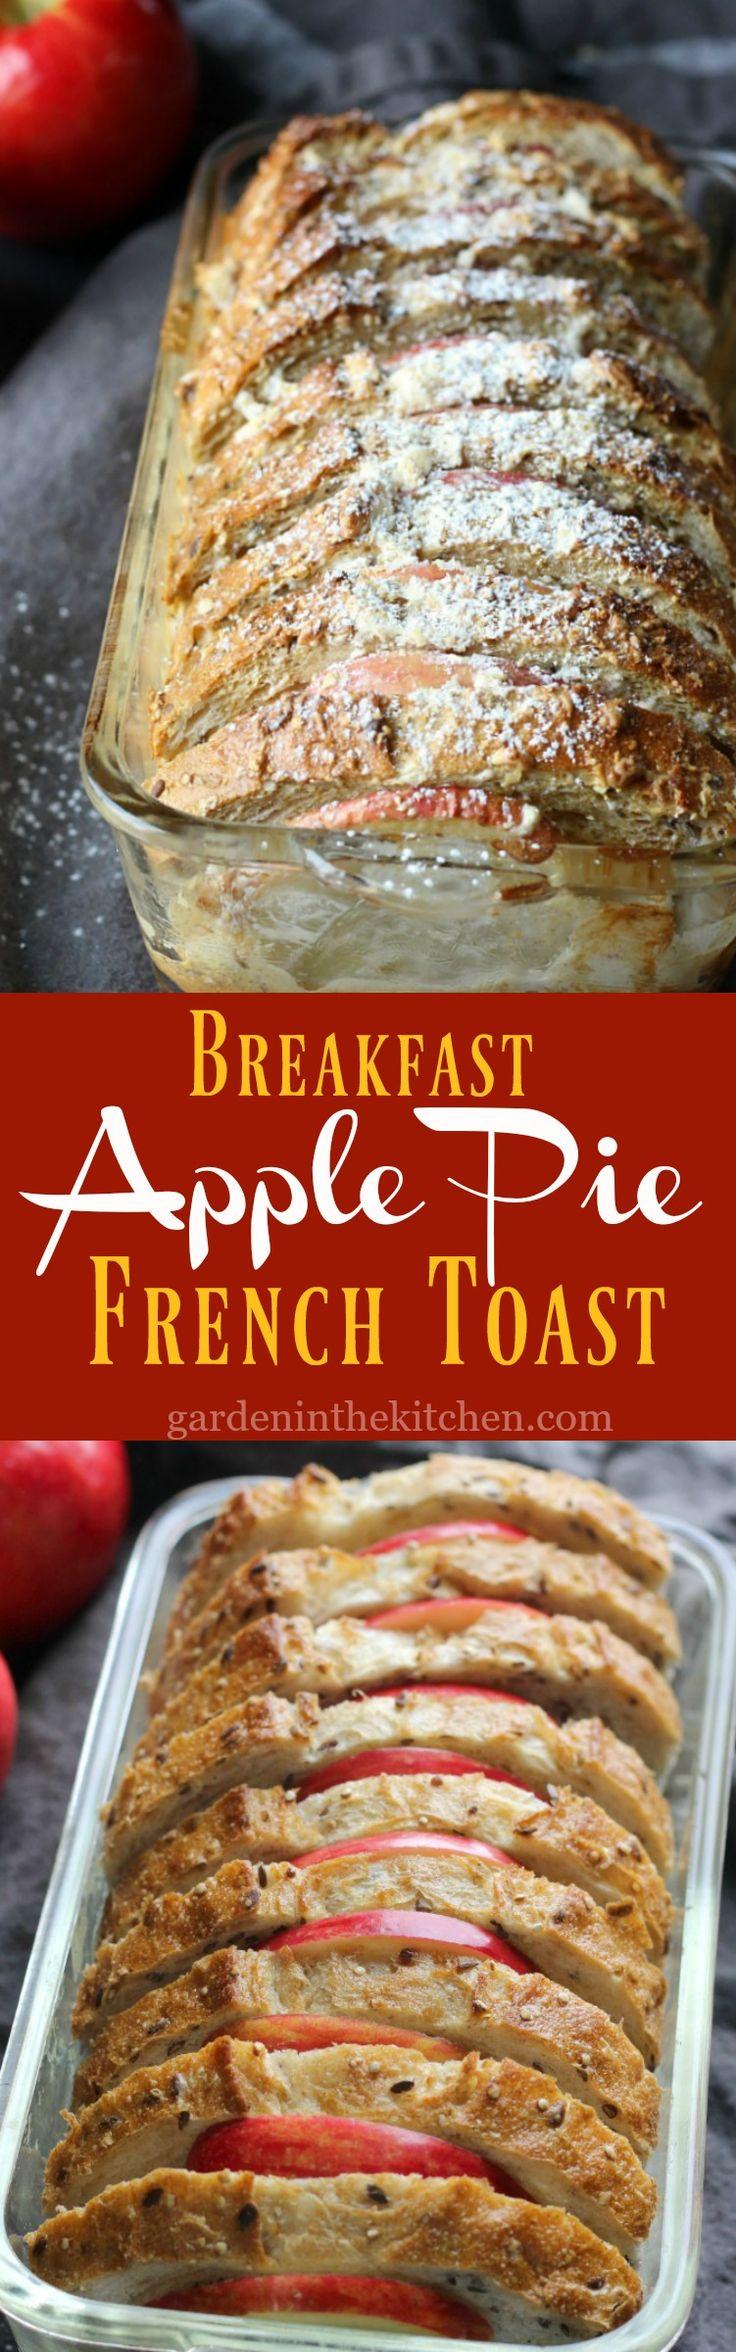 Breakfast Apple Pie French Toast